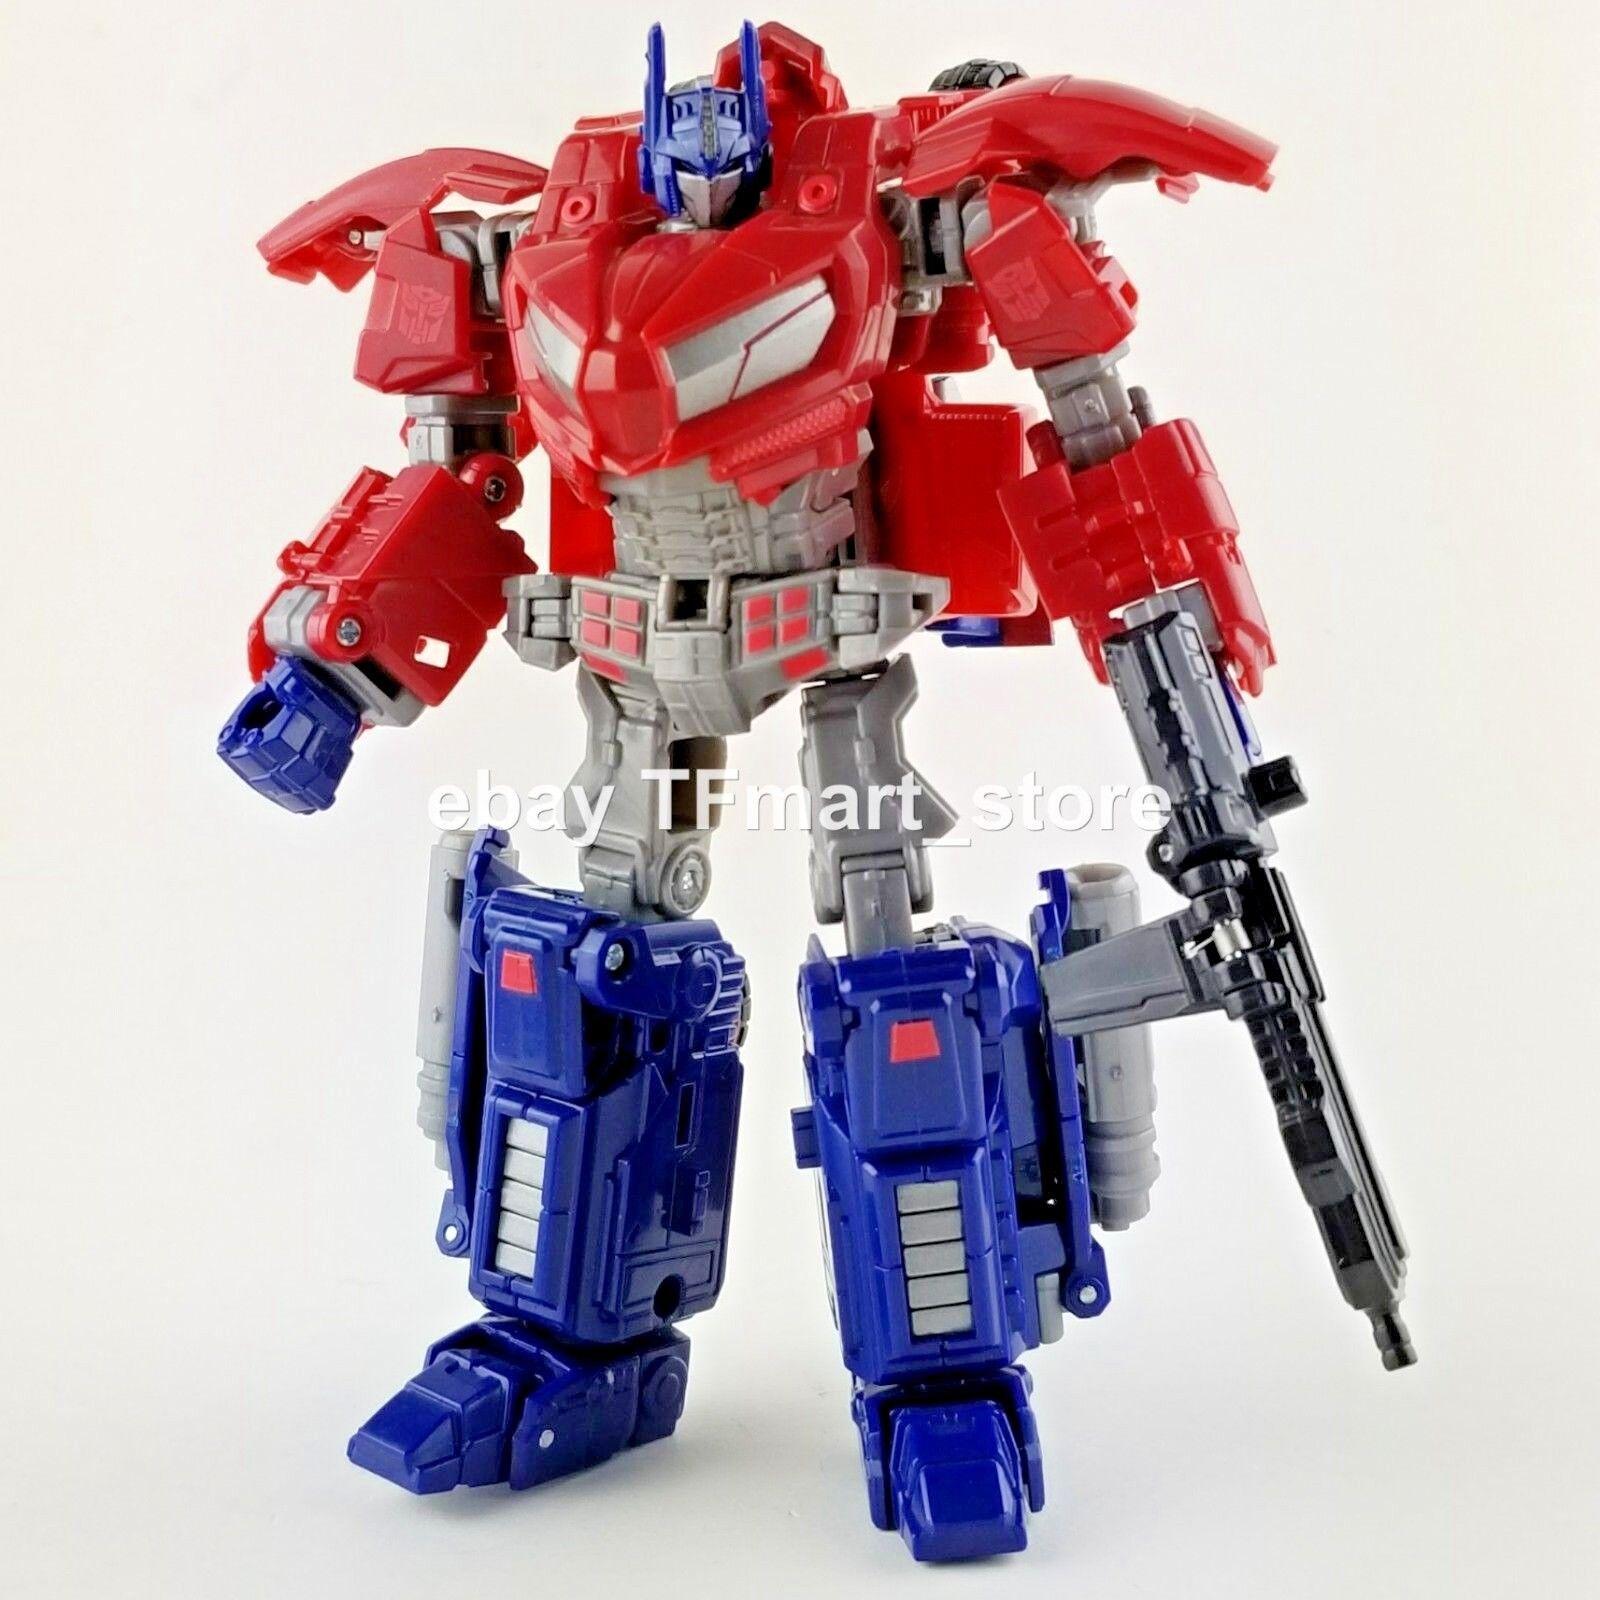 Transformers Generations la Guerra por Cybertron Wfc Optimus Prime 100%